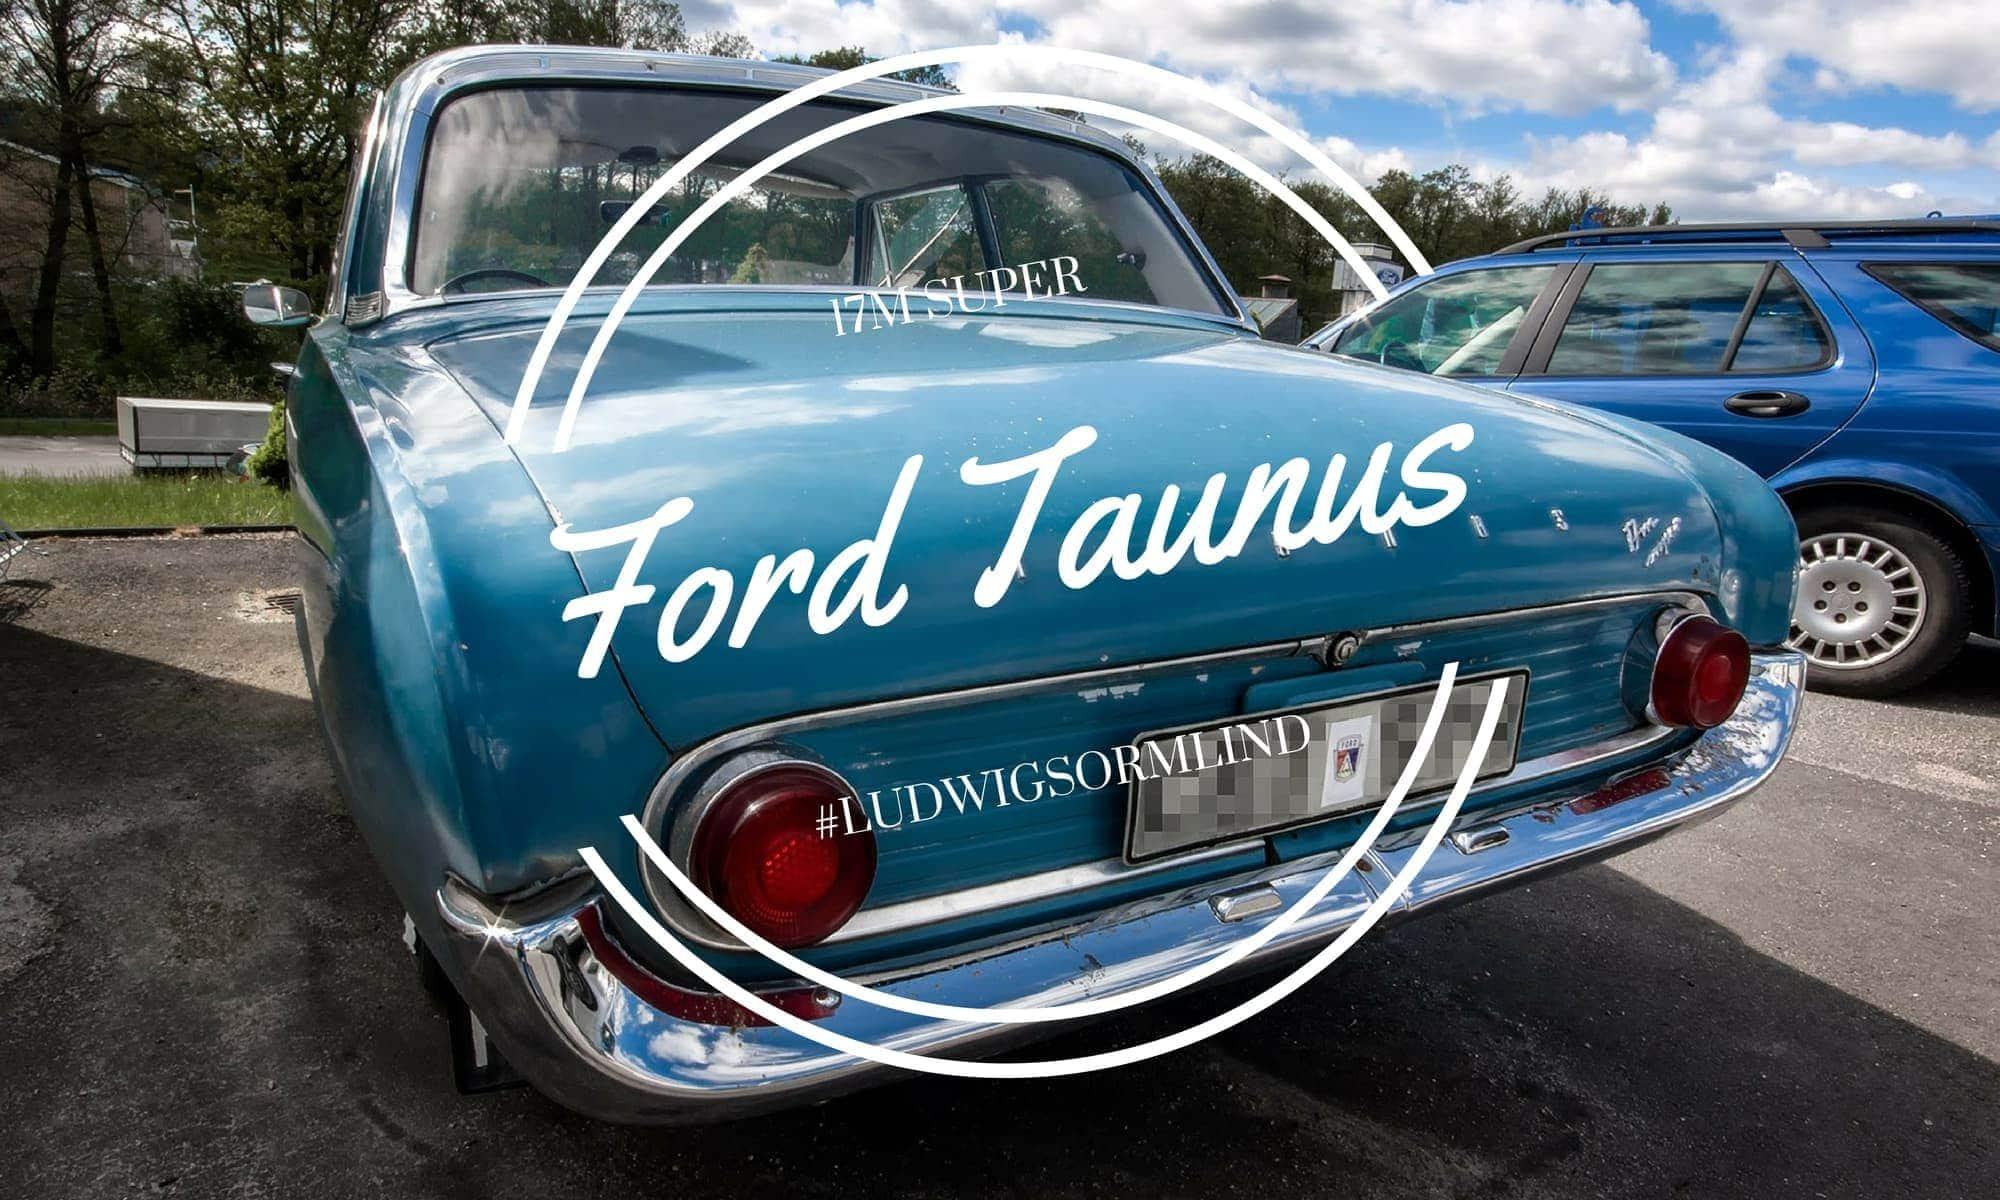 Ford Taunus 17M Super - Ludwig Sörmlind